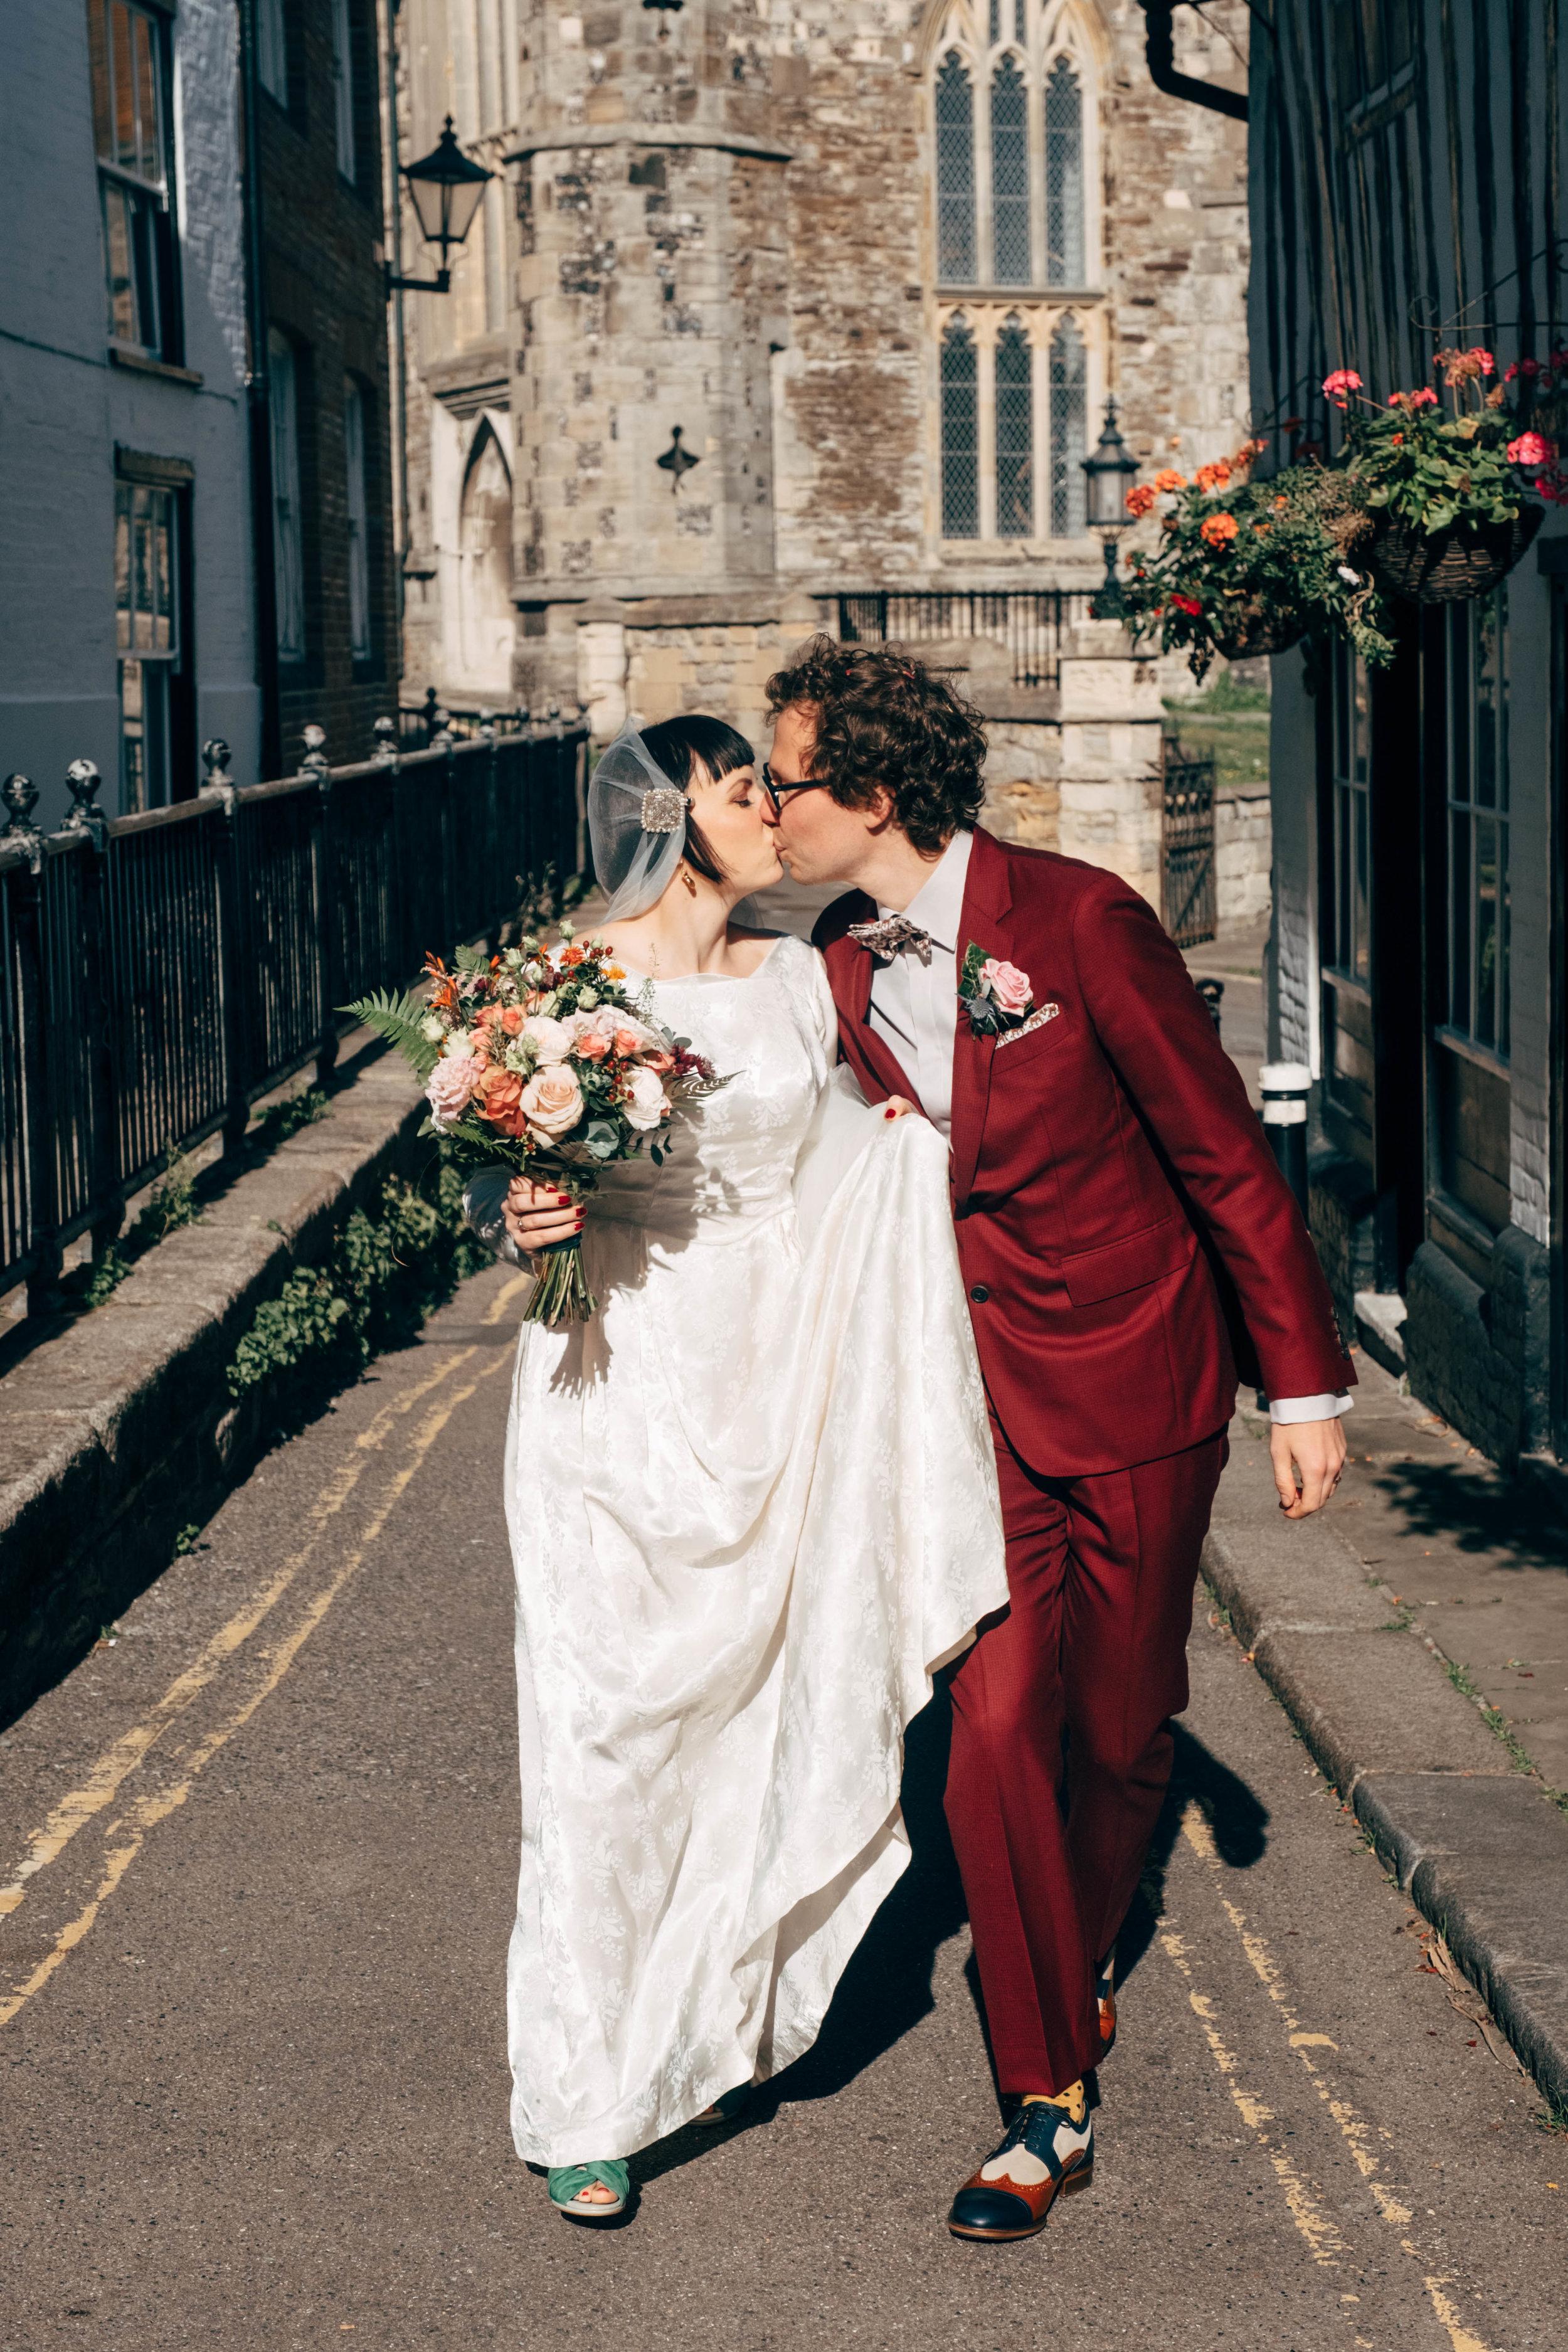 Jacob Sophia Wedding Photos130.jpg